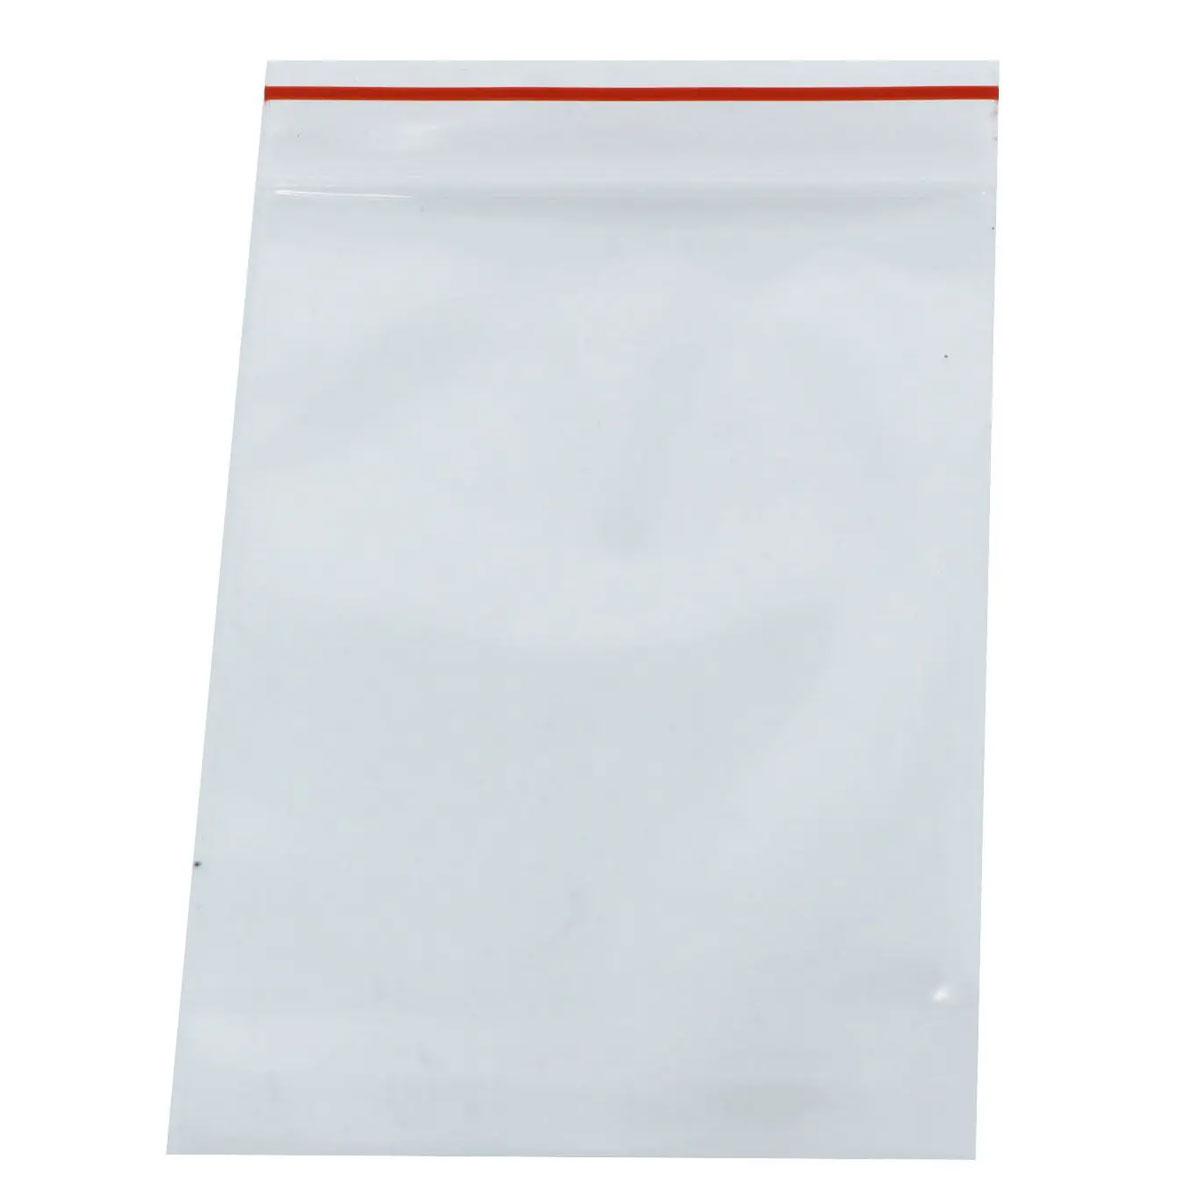 100 x Saco Plástico Zip Lock Hermético 34 x 24 cm Nº 10